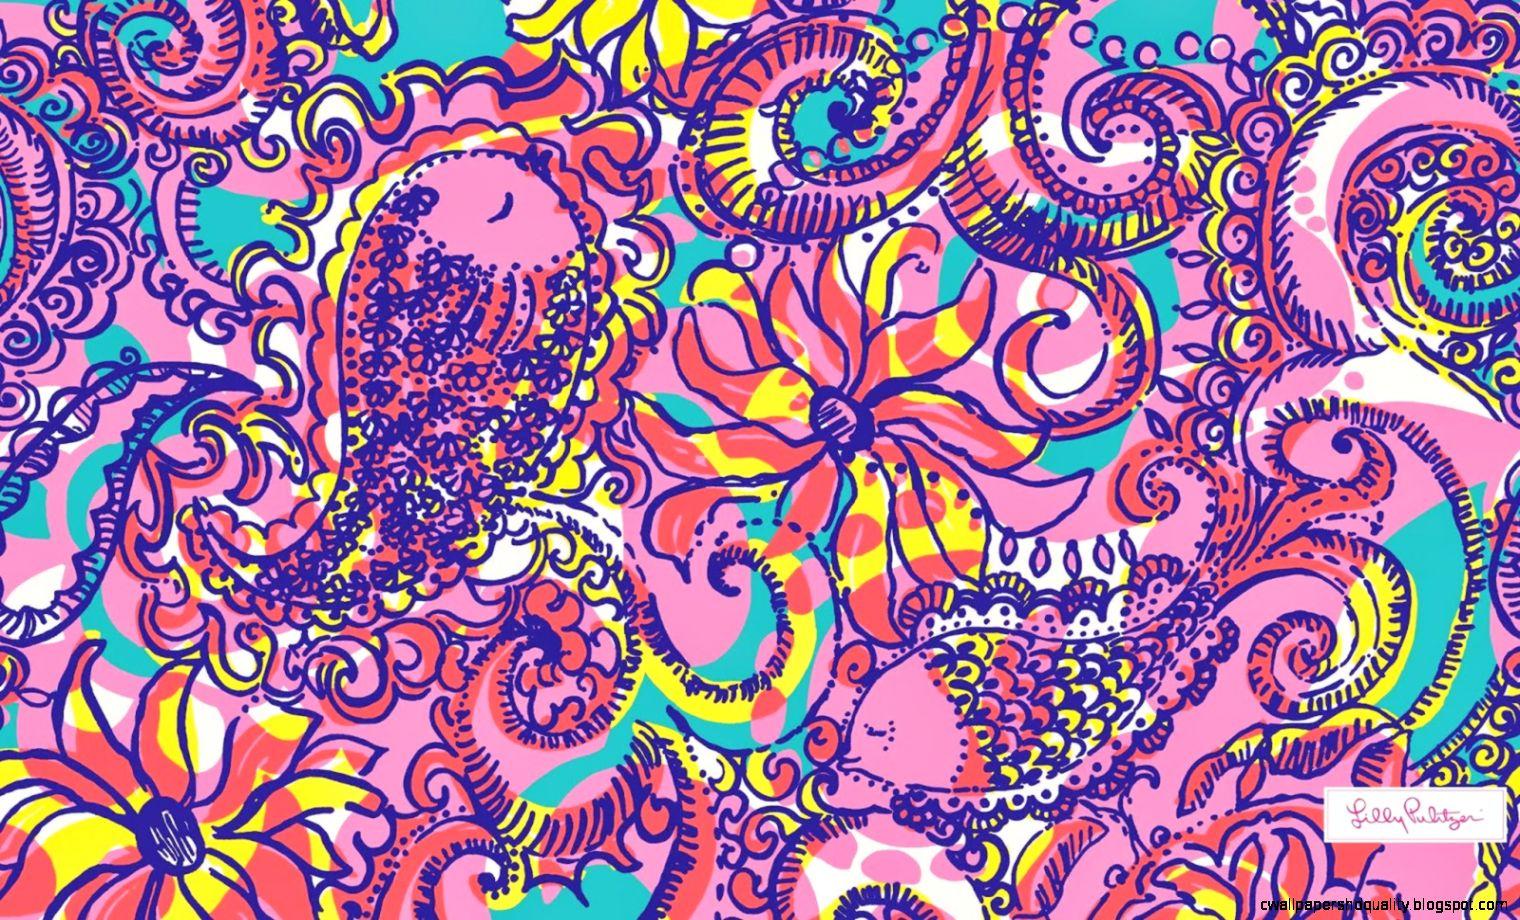 High Resolution Lilly Pulitzer Wallpaper WallpaperSafari